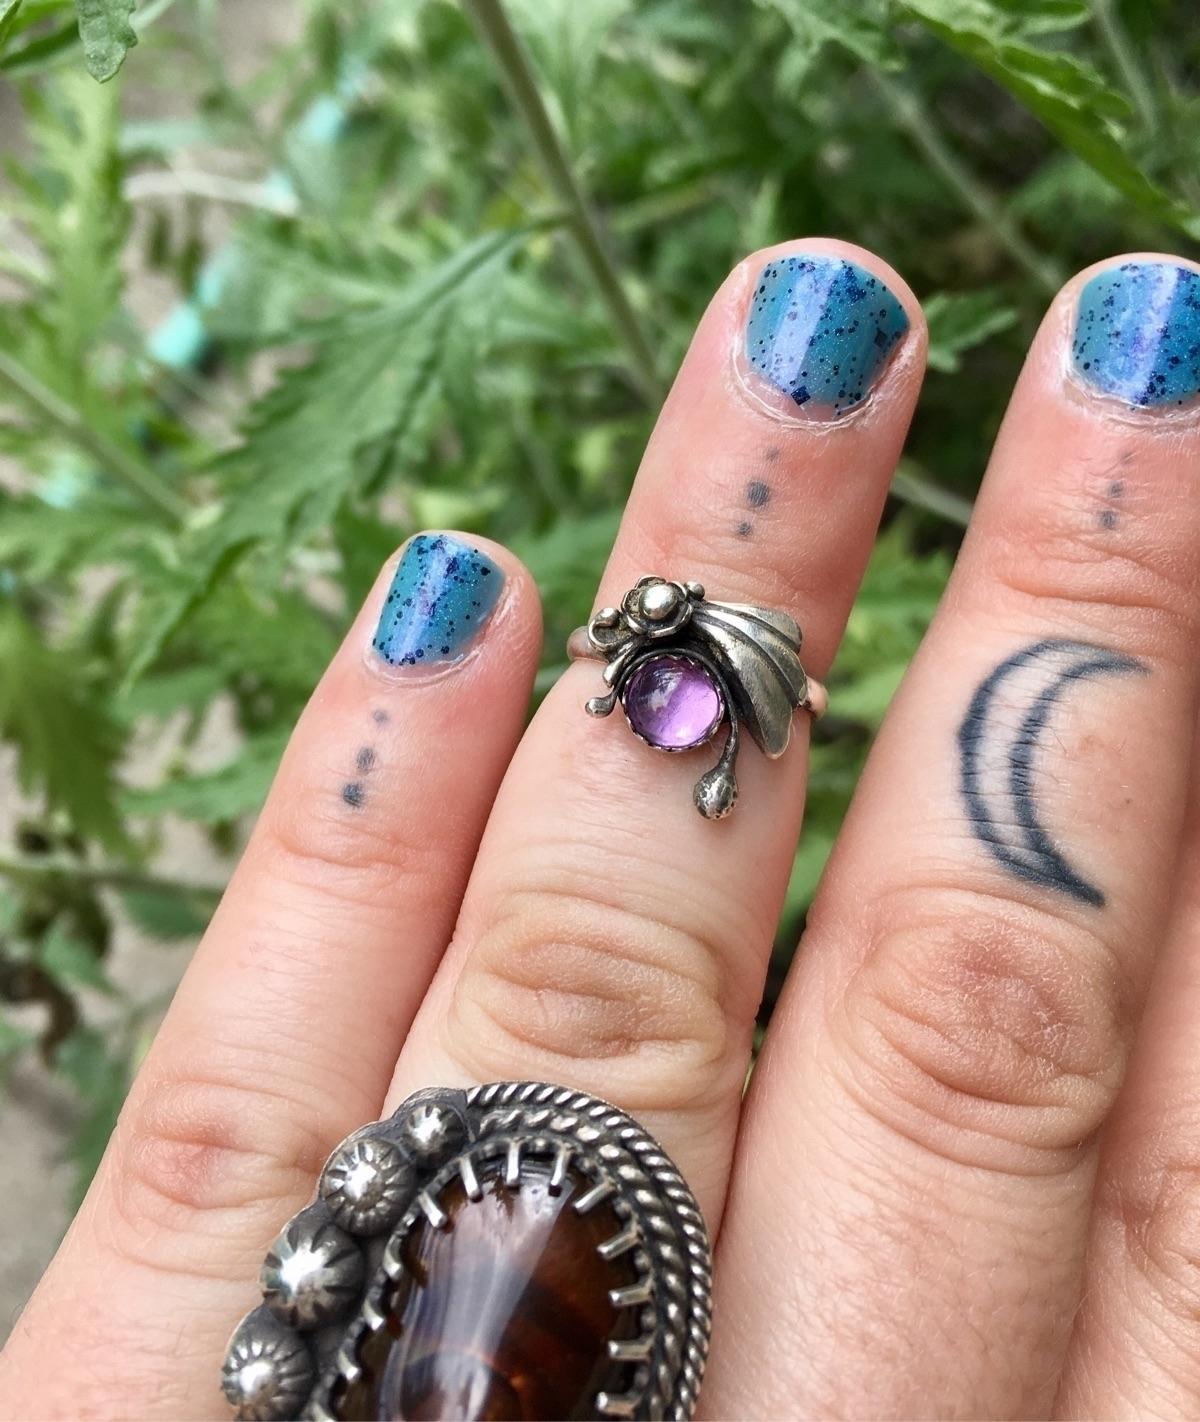 Shooting Star Flower Midi Ring - willowmetals | ello